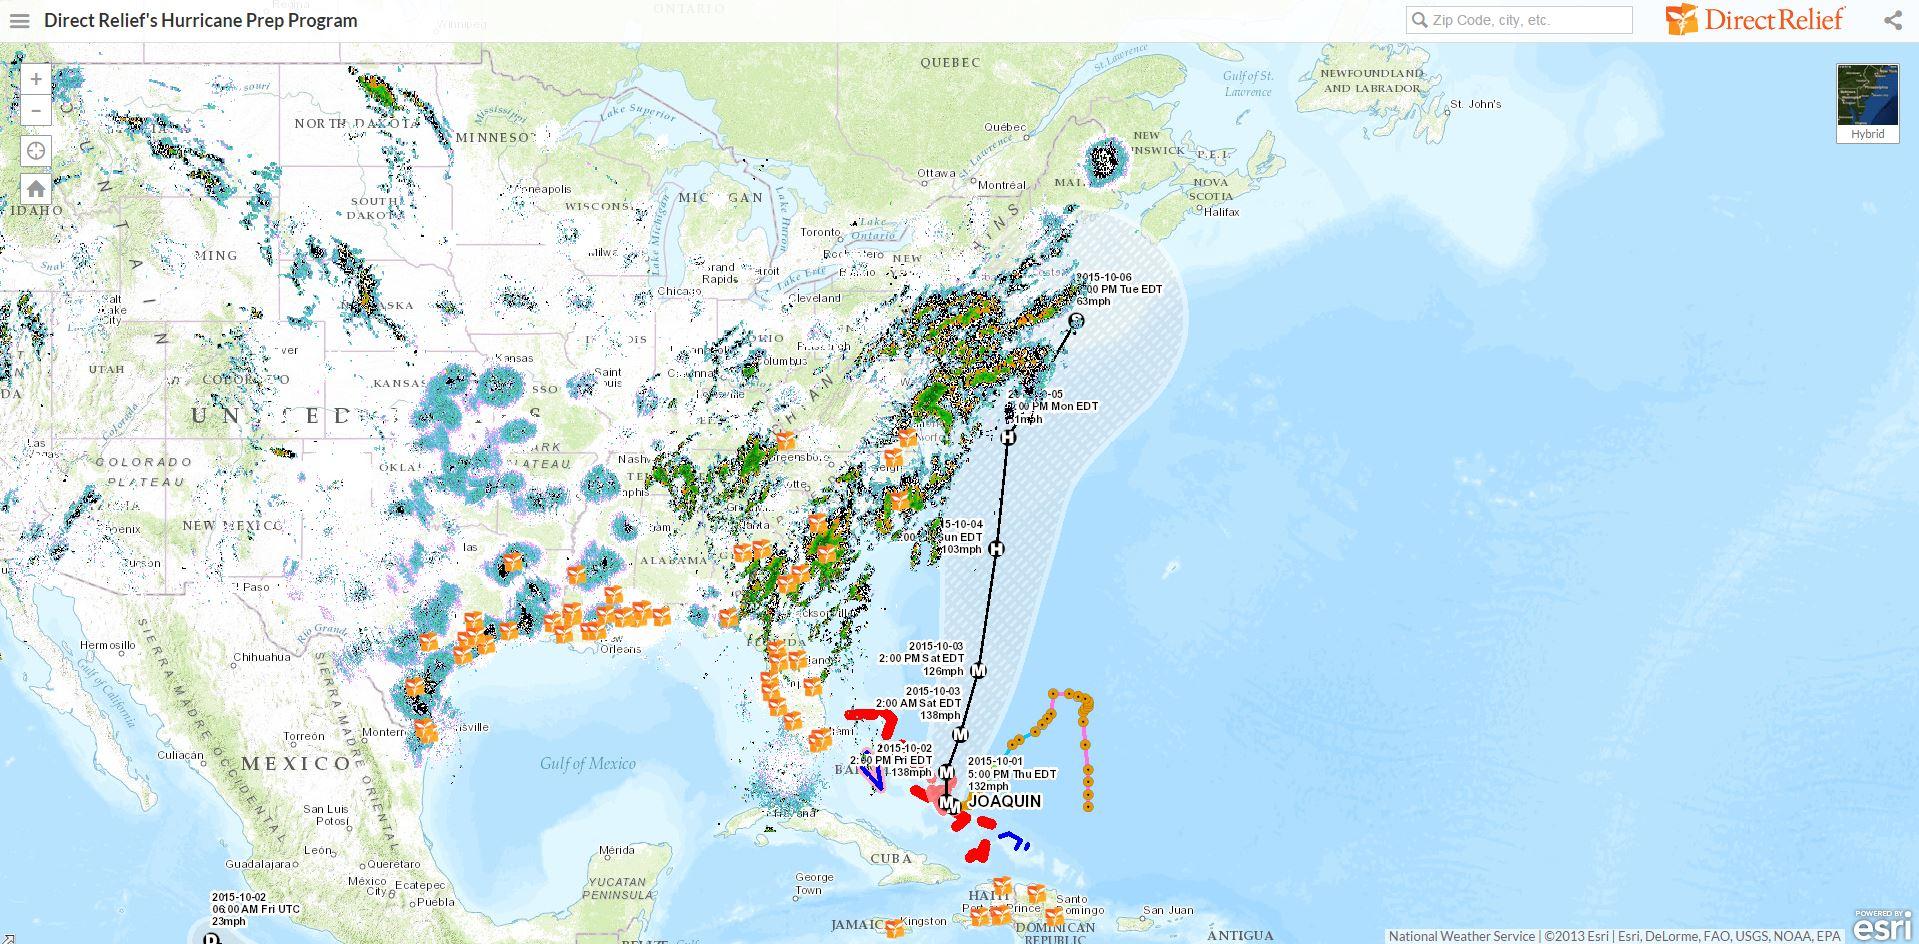 Hurricane Joaquin - Direct Relief Hurricane Map